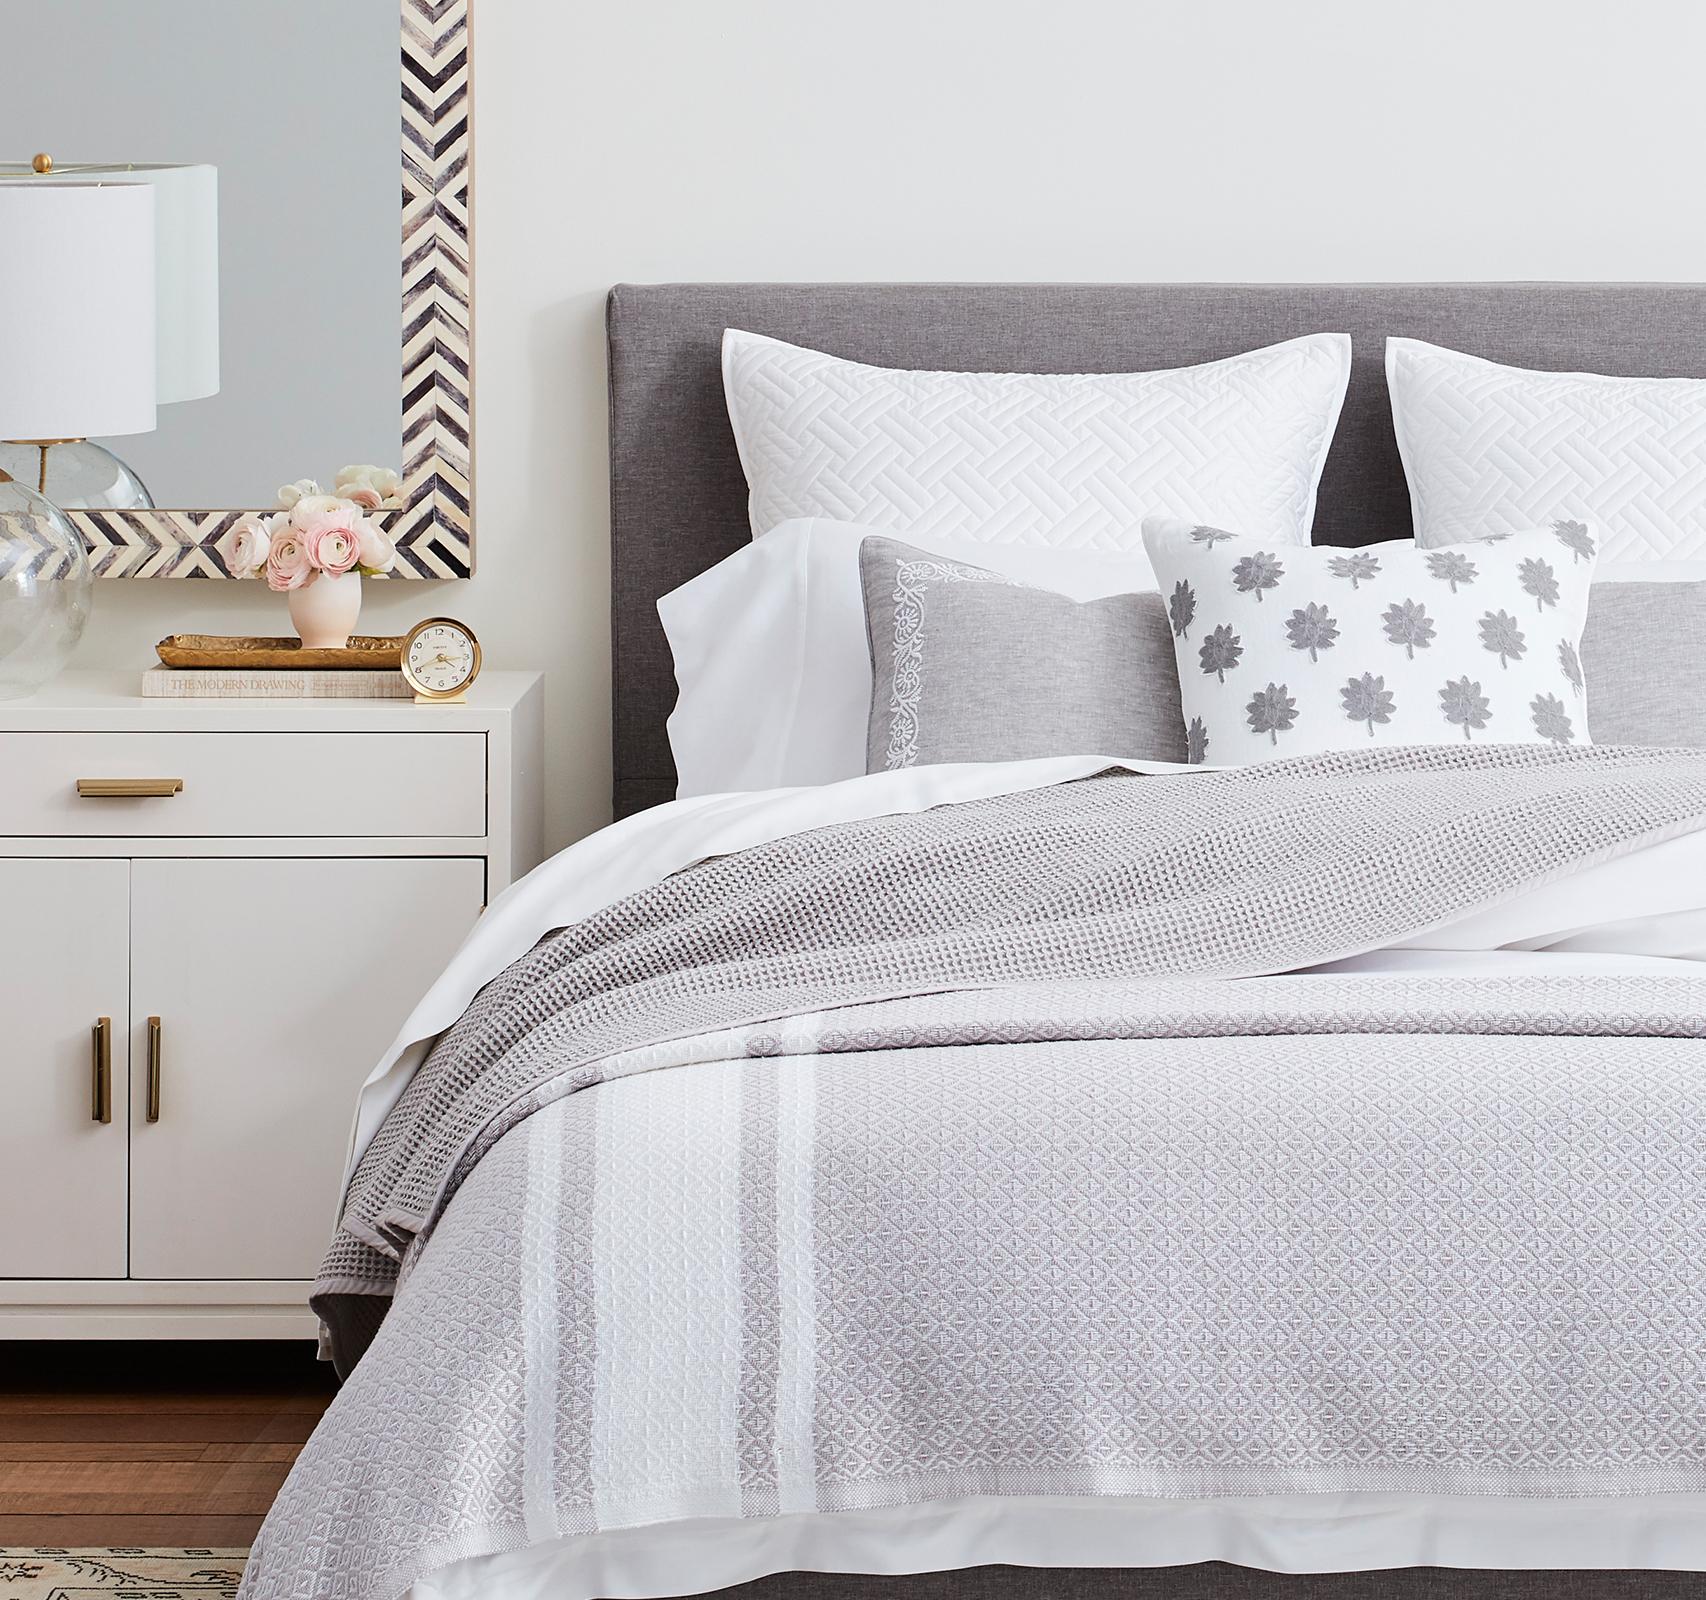 Pewter Textured Bedroom header image